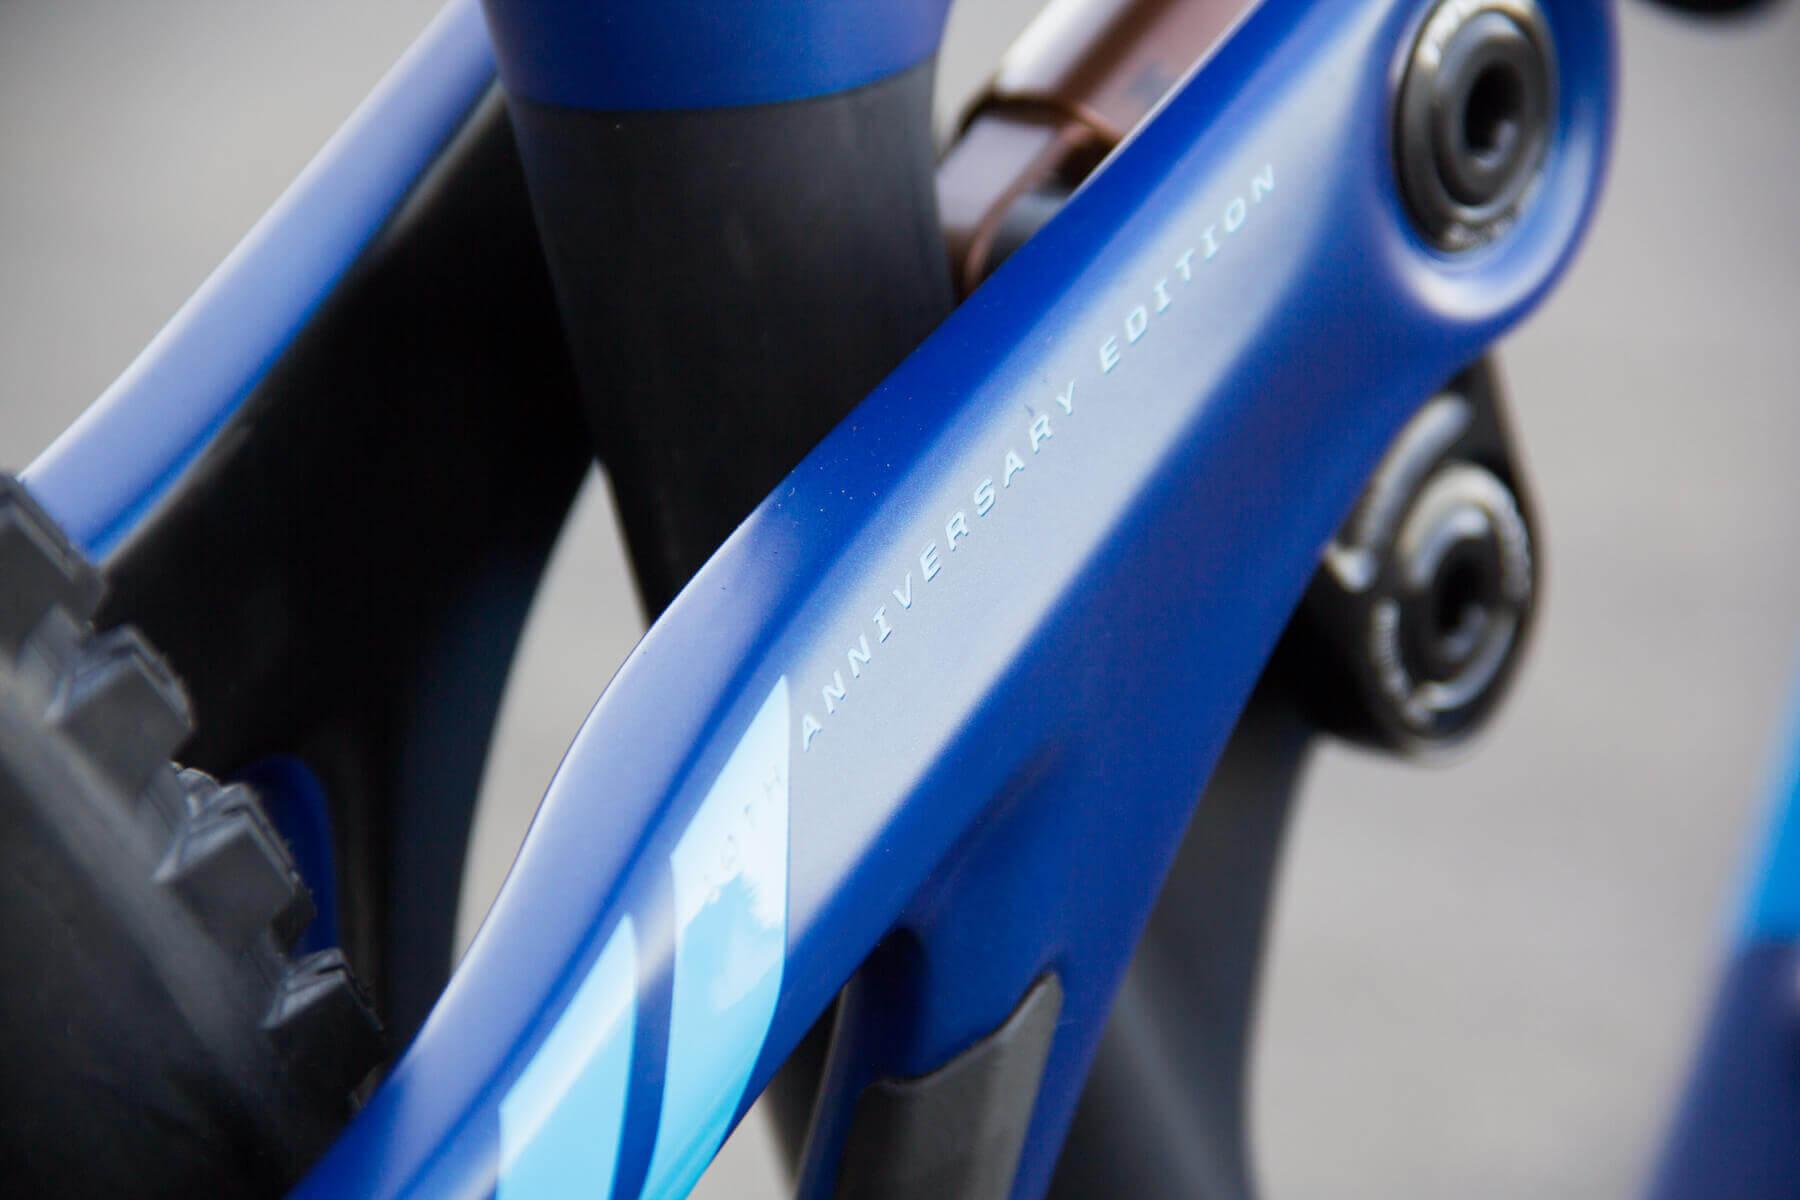 Pivot 5.5 Anniversary Edition - Very Blue Edition